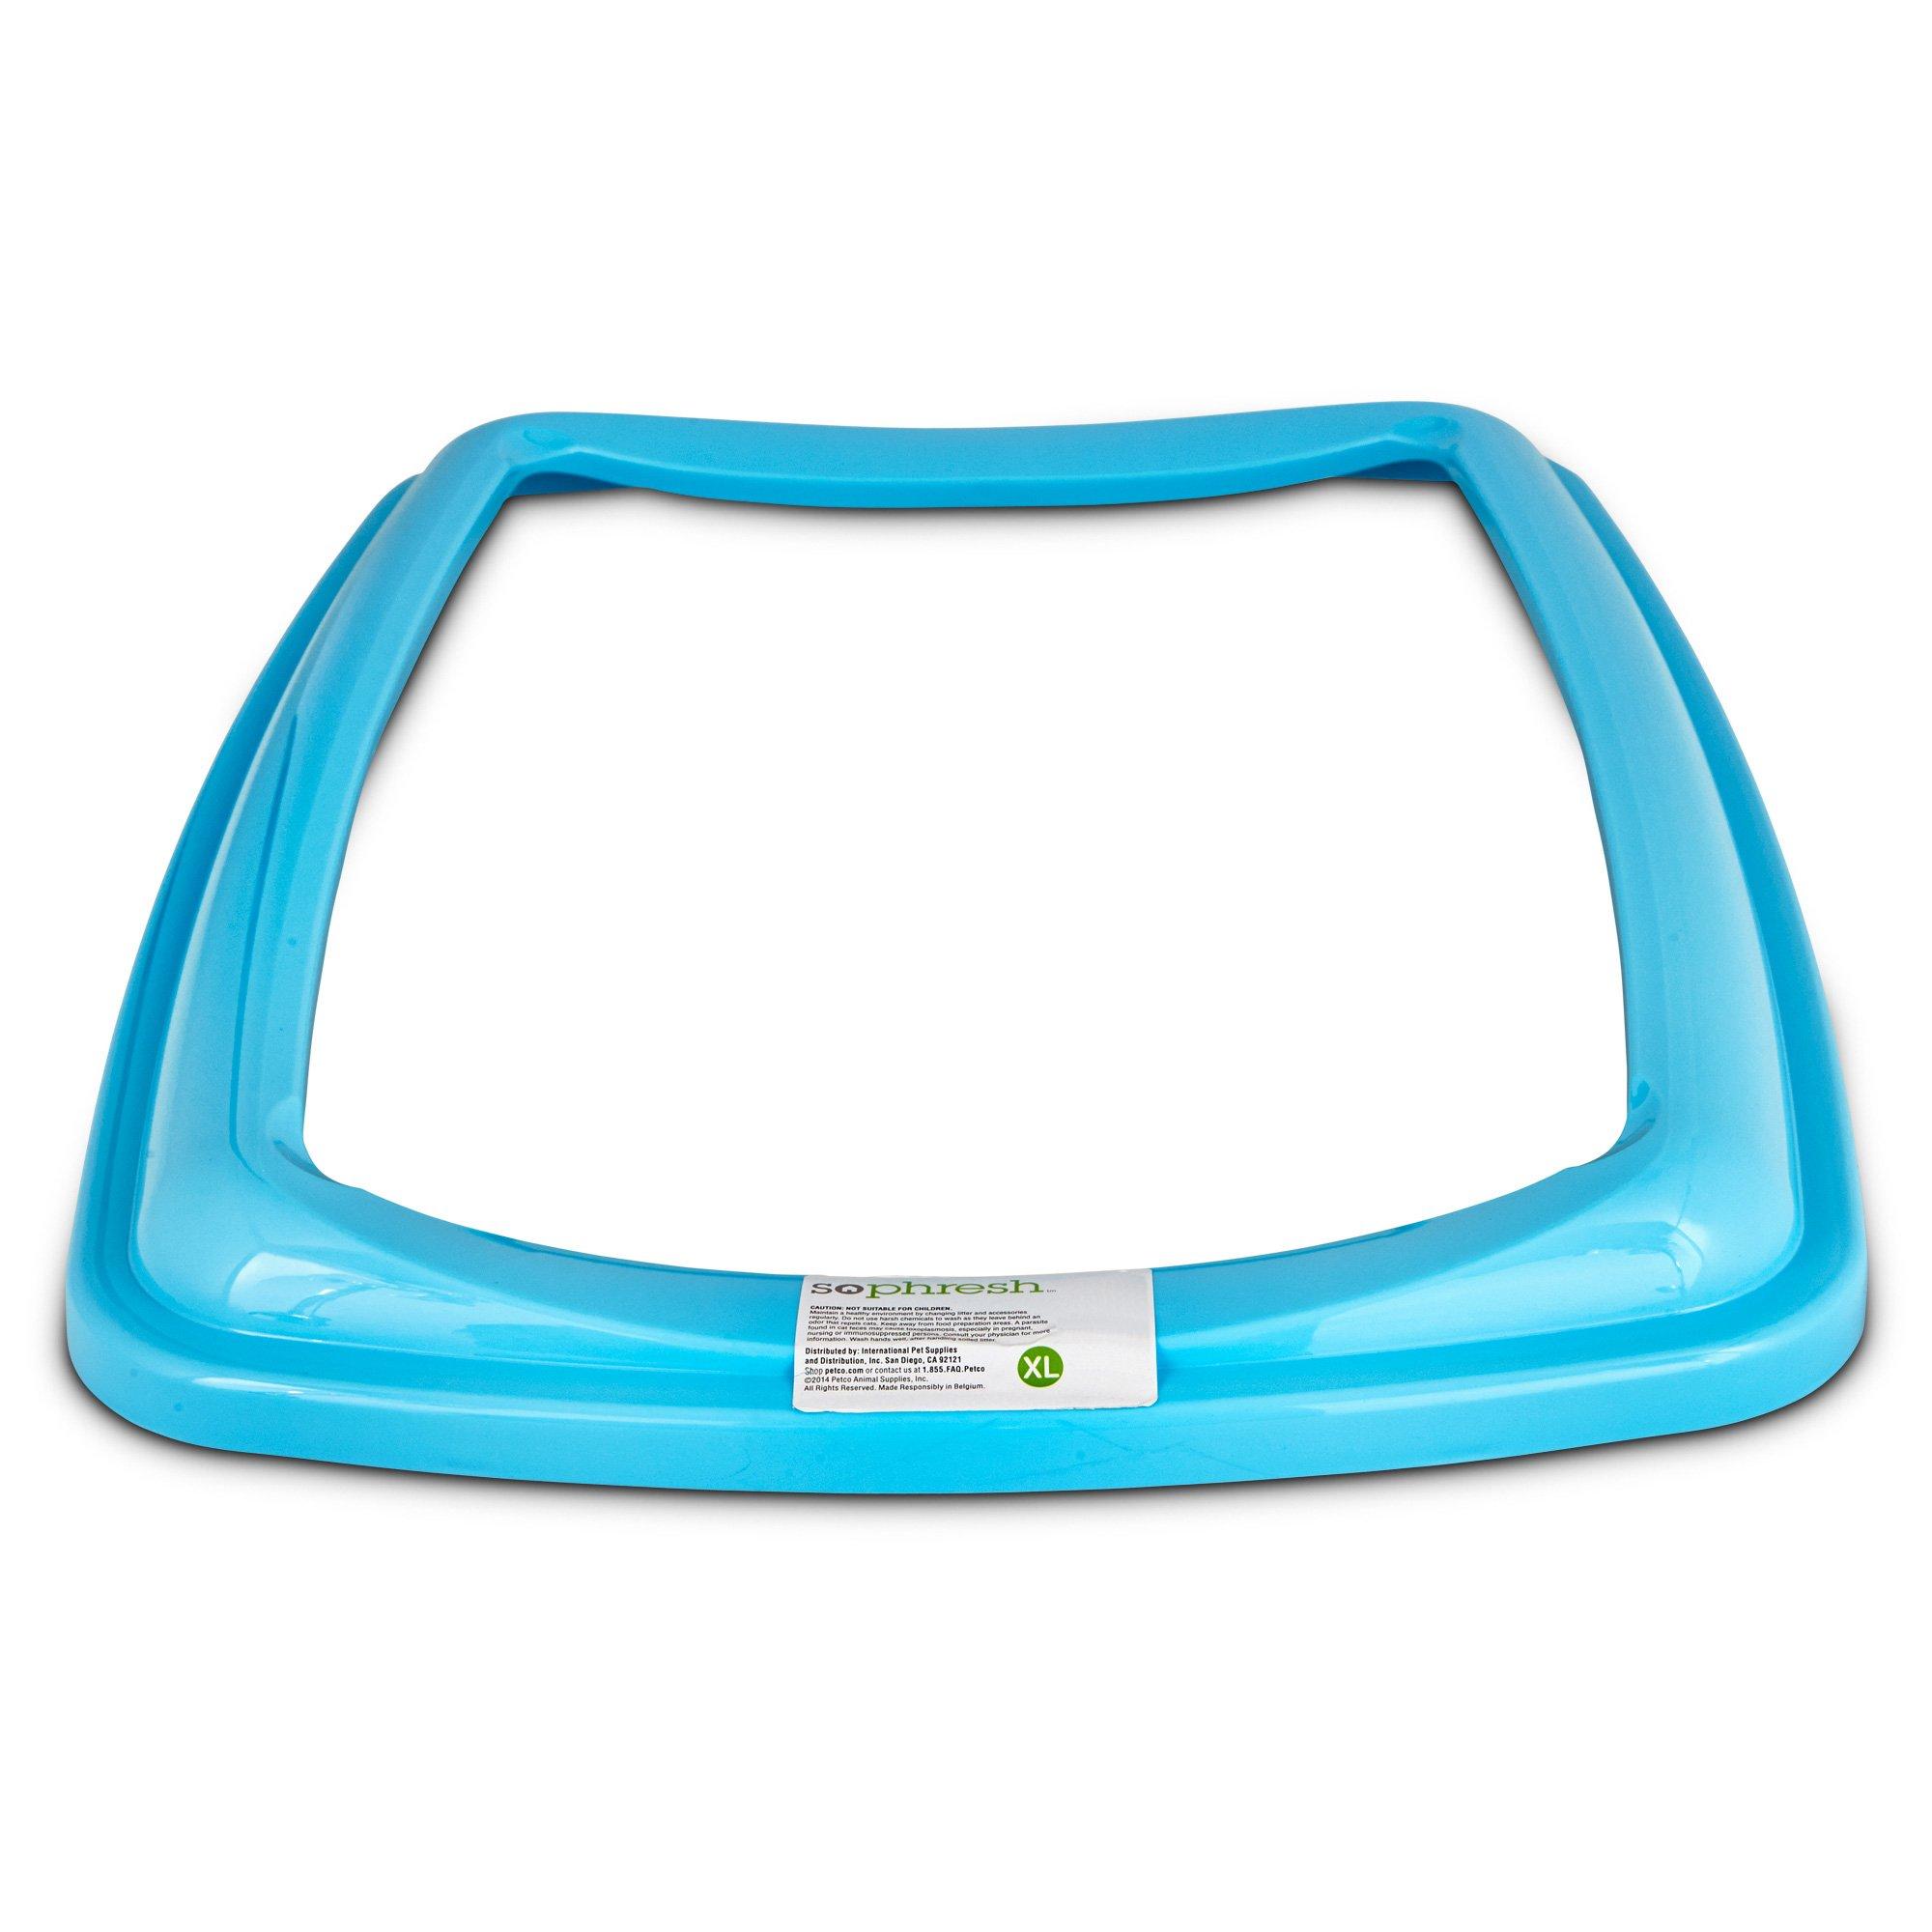 So Phresh Aqua Blue X-Large Open Litter Box Rim